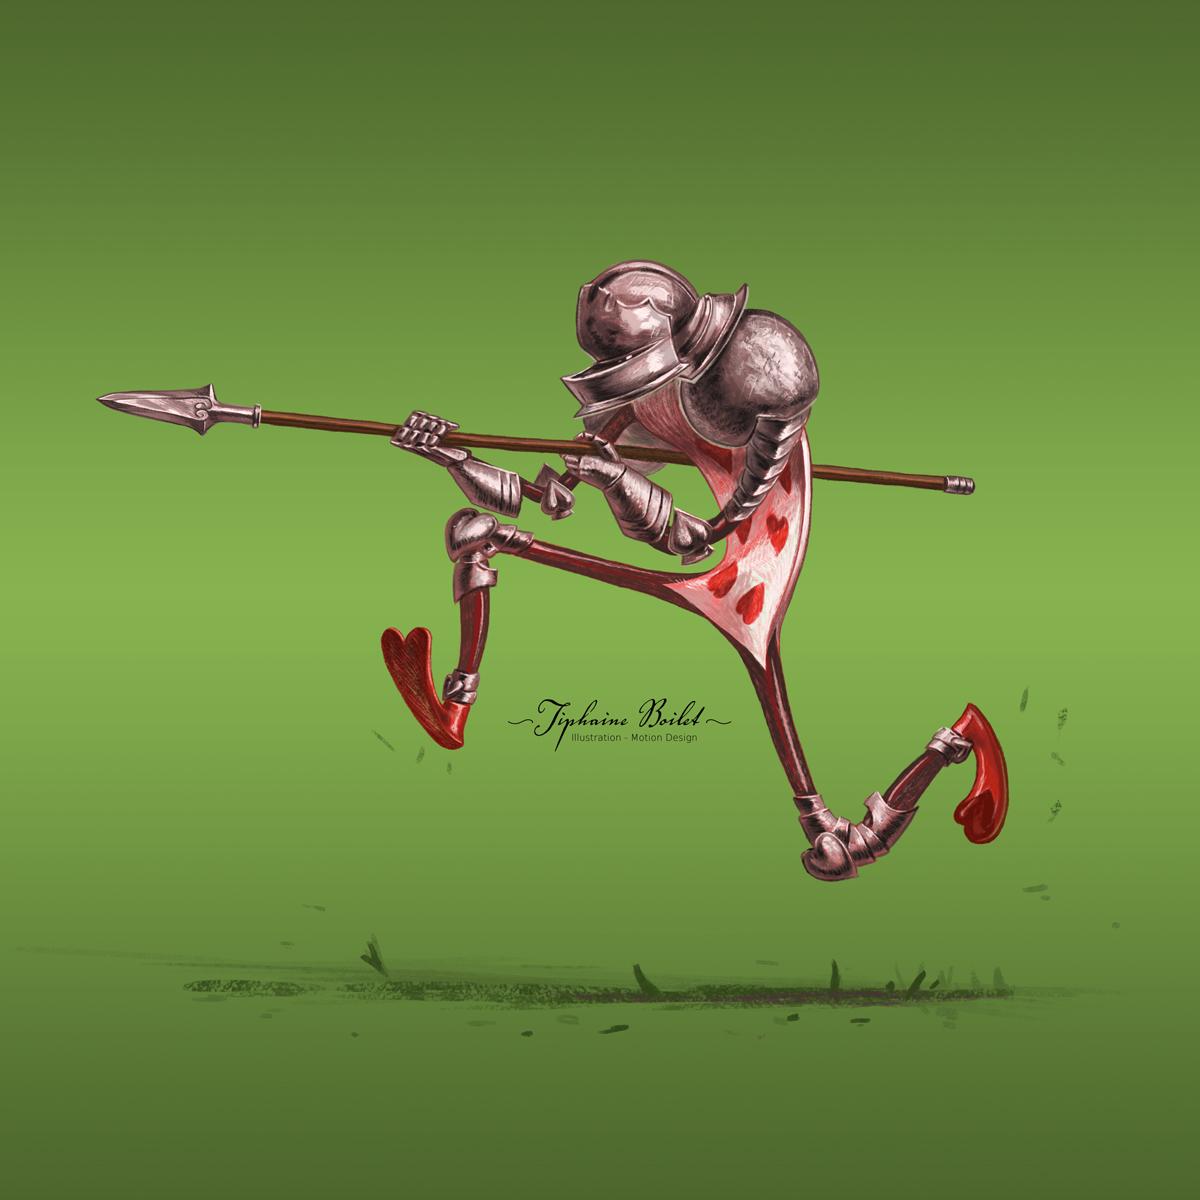 Character design challenge illustration digitale Tiphaine Boilet illustratrice freelance Nantes Alice au pays des merveilles illustration